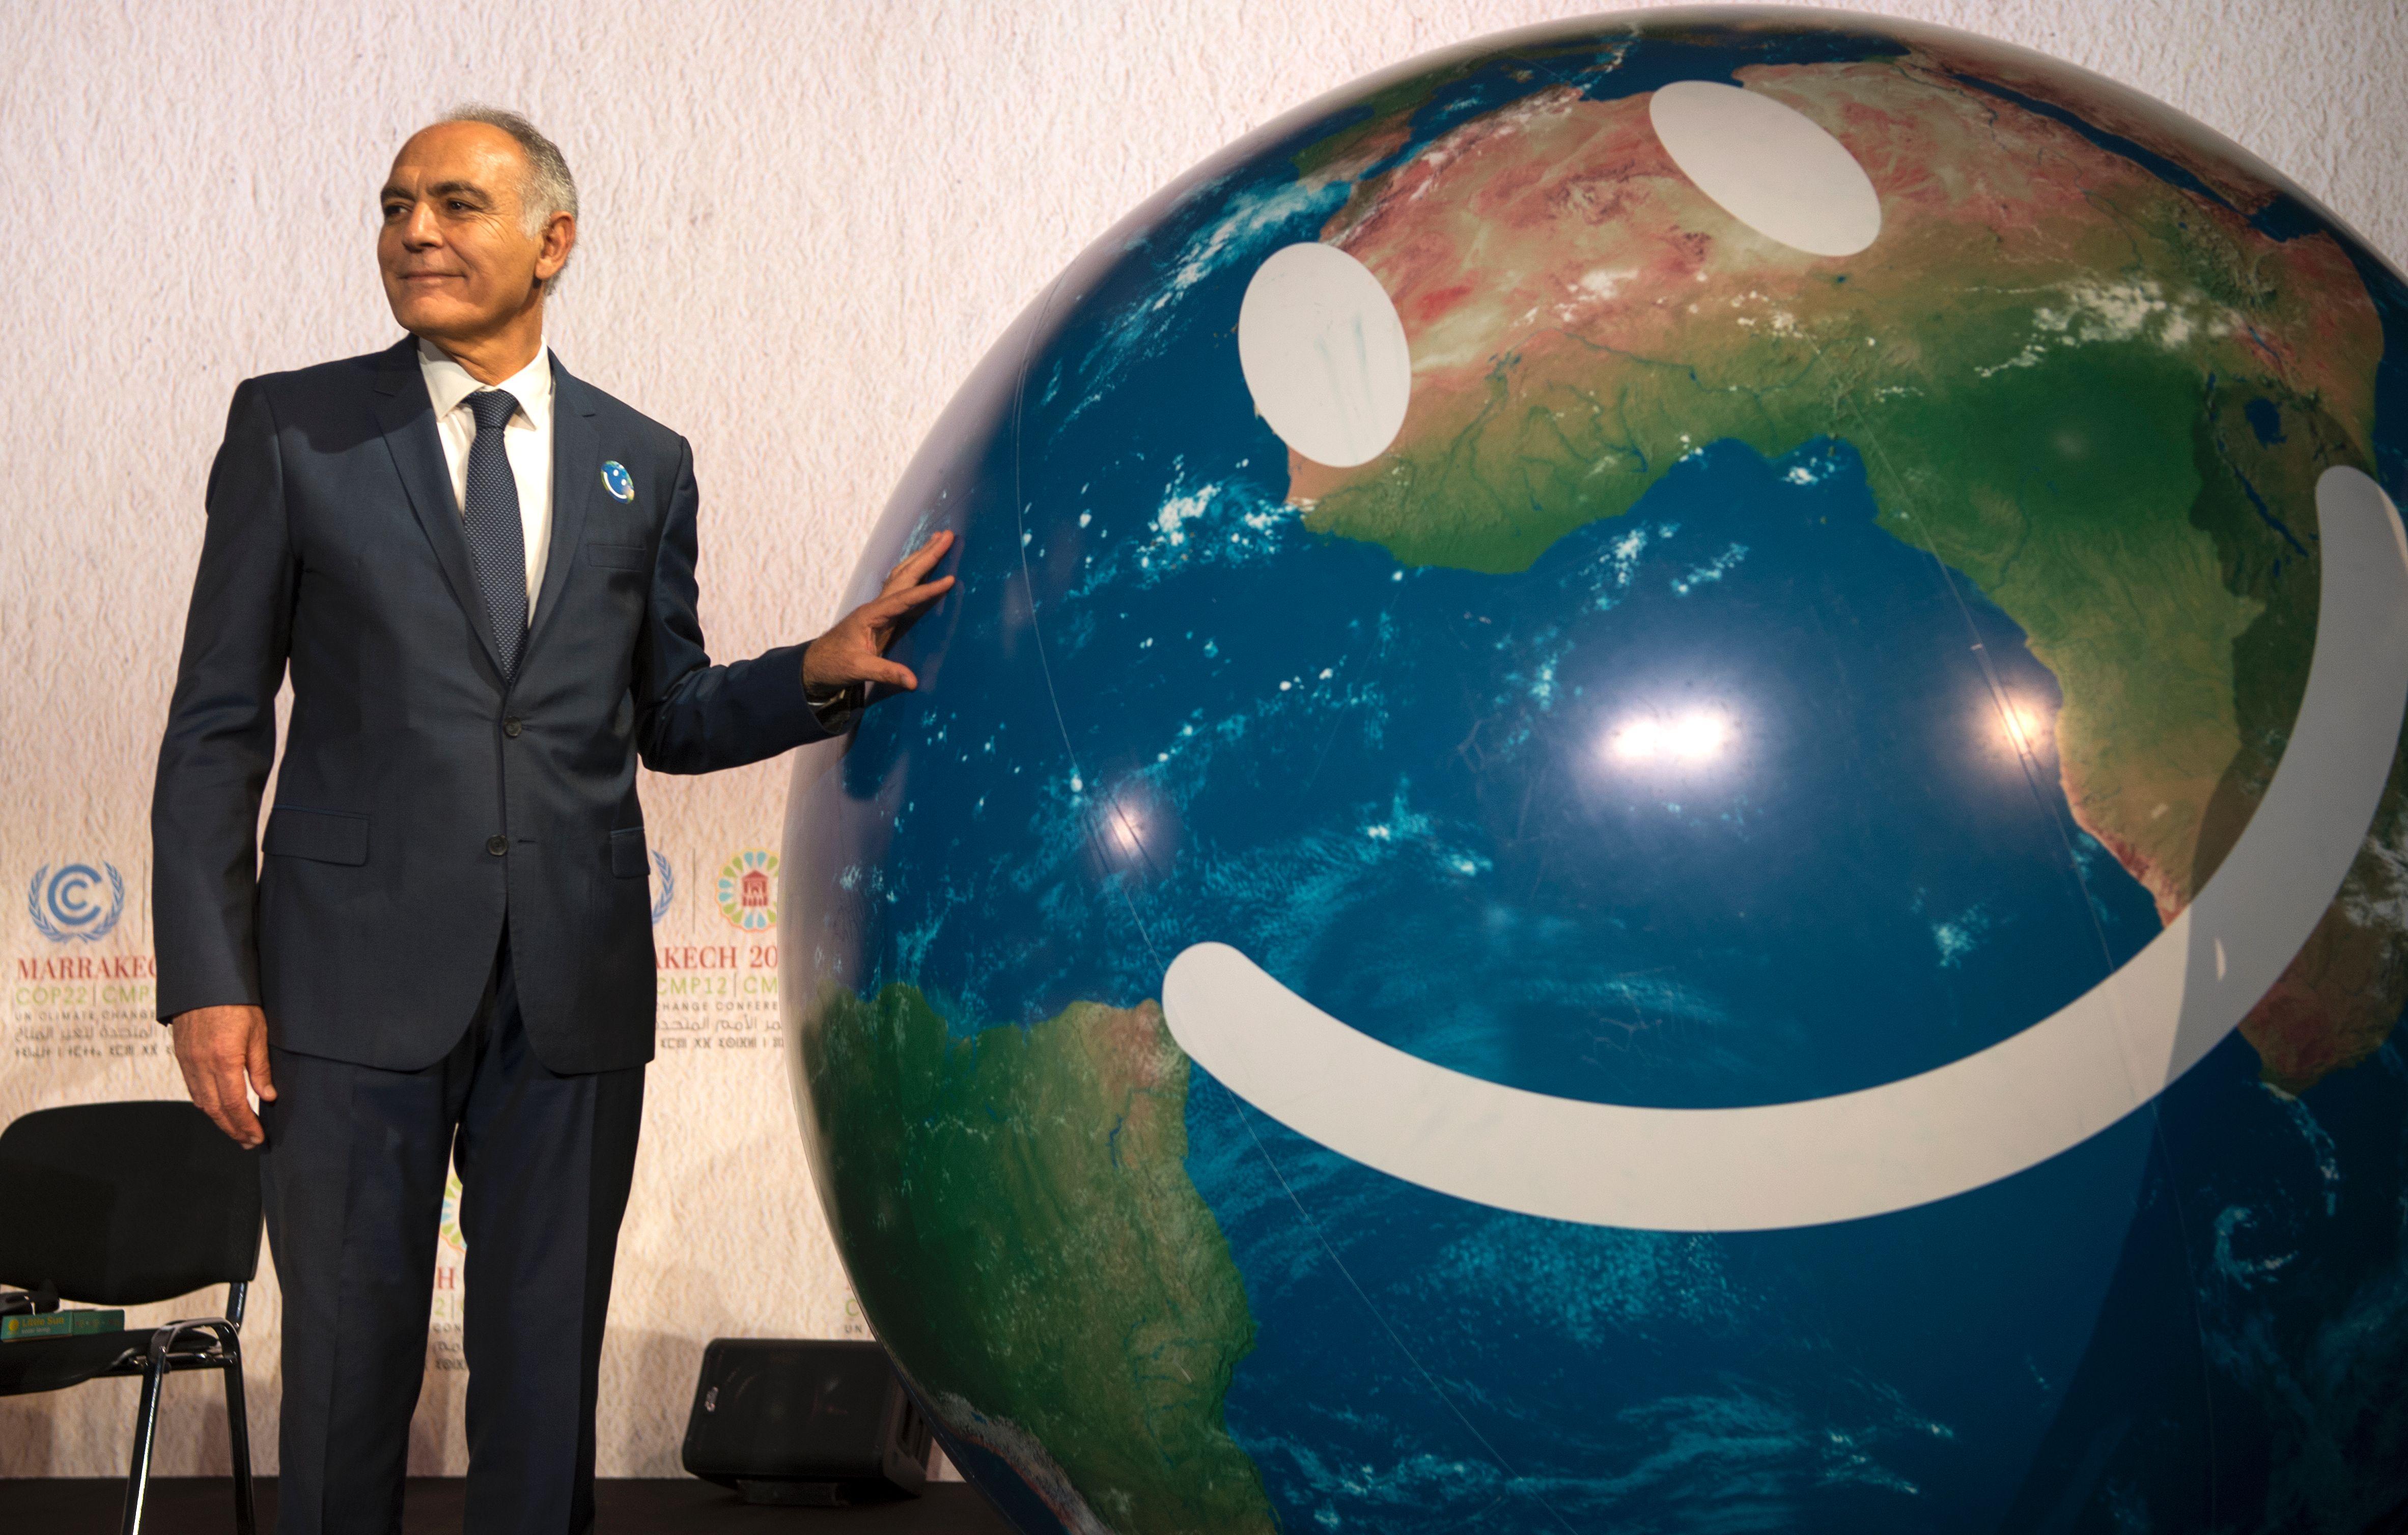 COP22 president Salaheddine Mezouar caresses a smiley Earth ball during a climate change summit